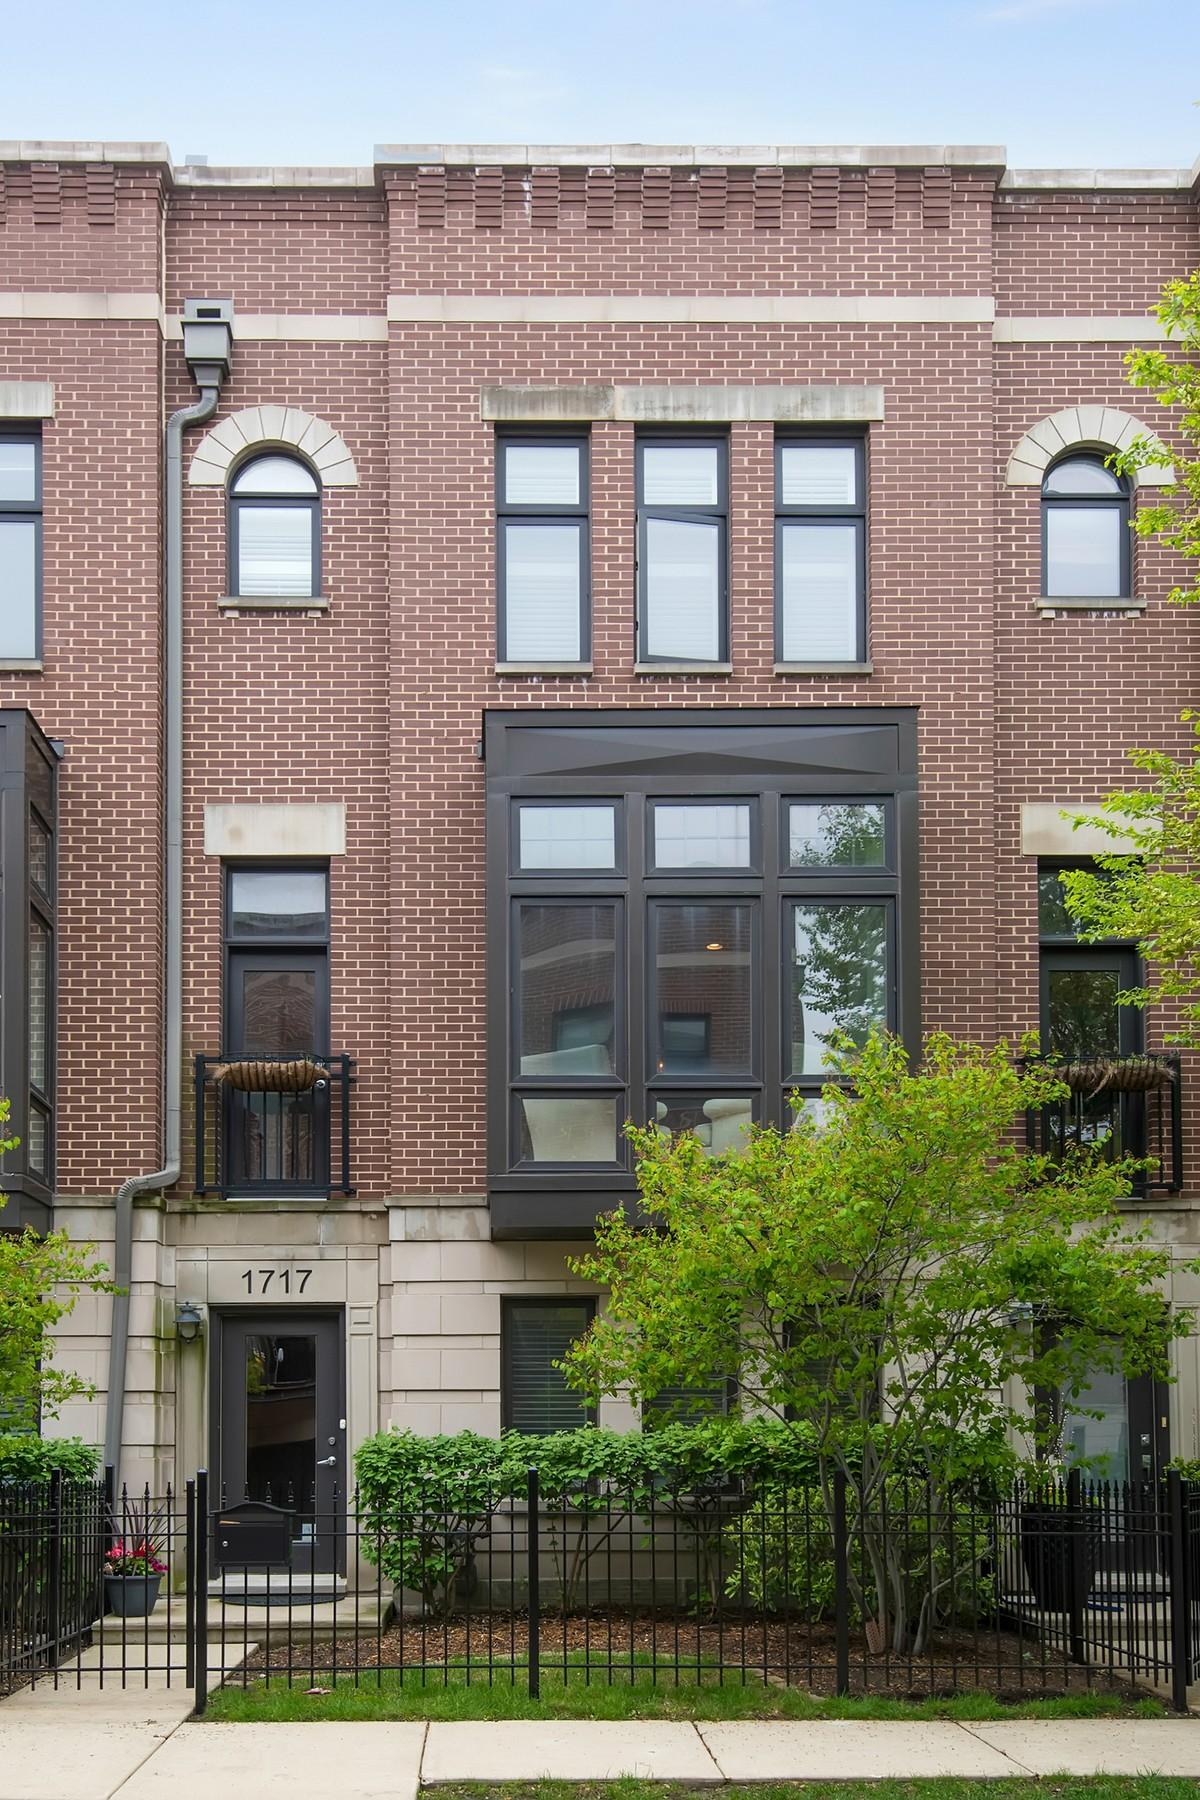 共管物業 為 出售 在 Immaculate Four Bed Four Bath Home 1717 W Surf Street Unit 22 Lakeview, Chicago, 伊利諾斯州, 60657 美國